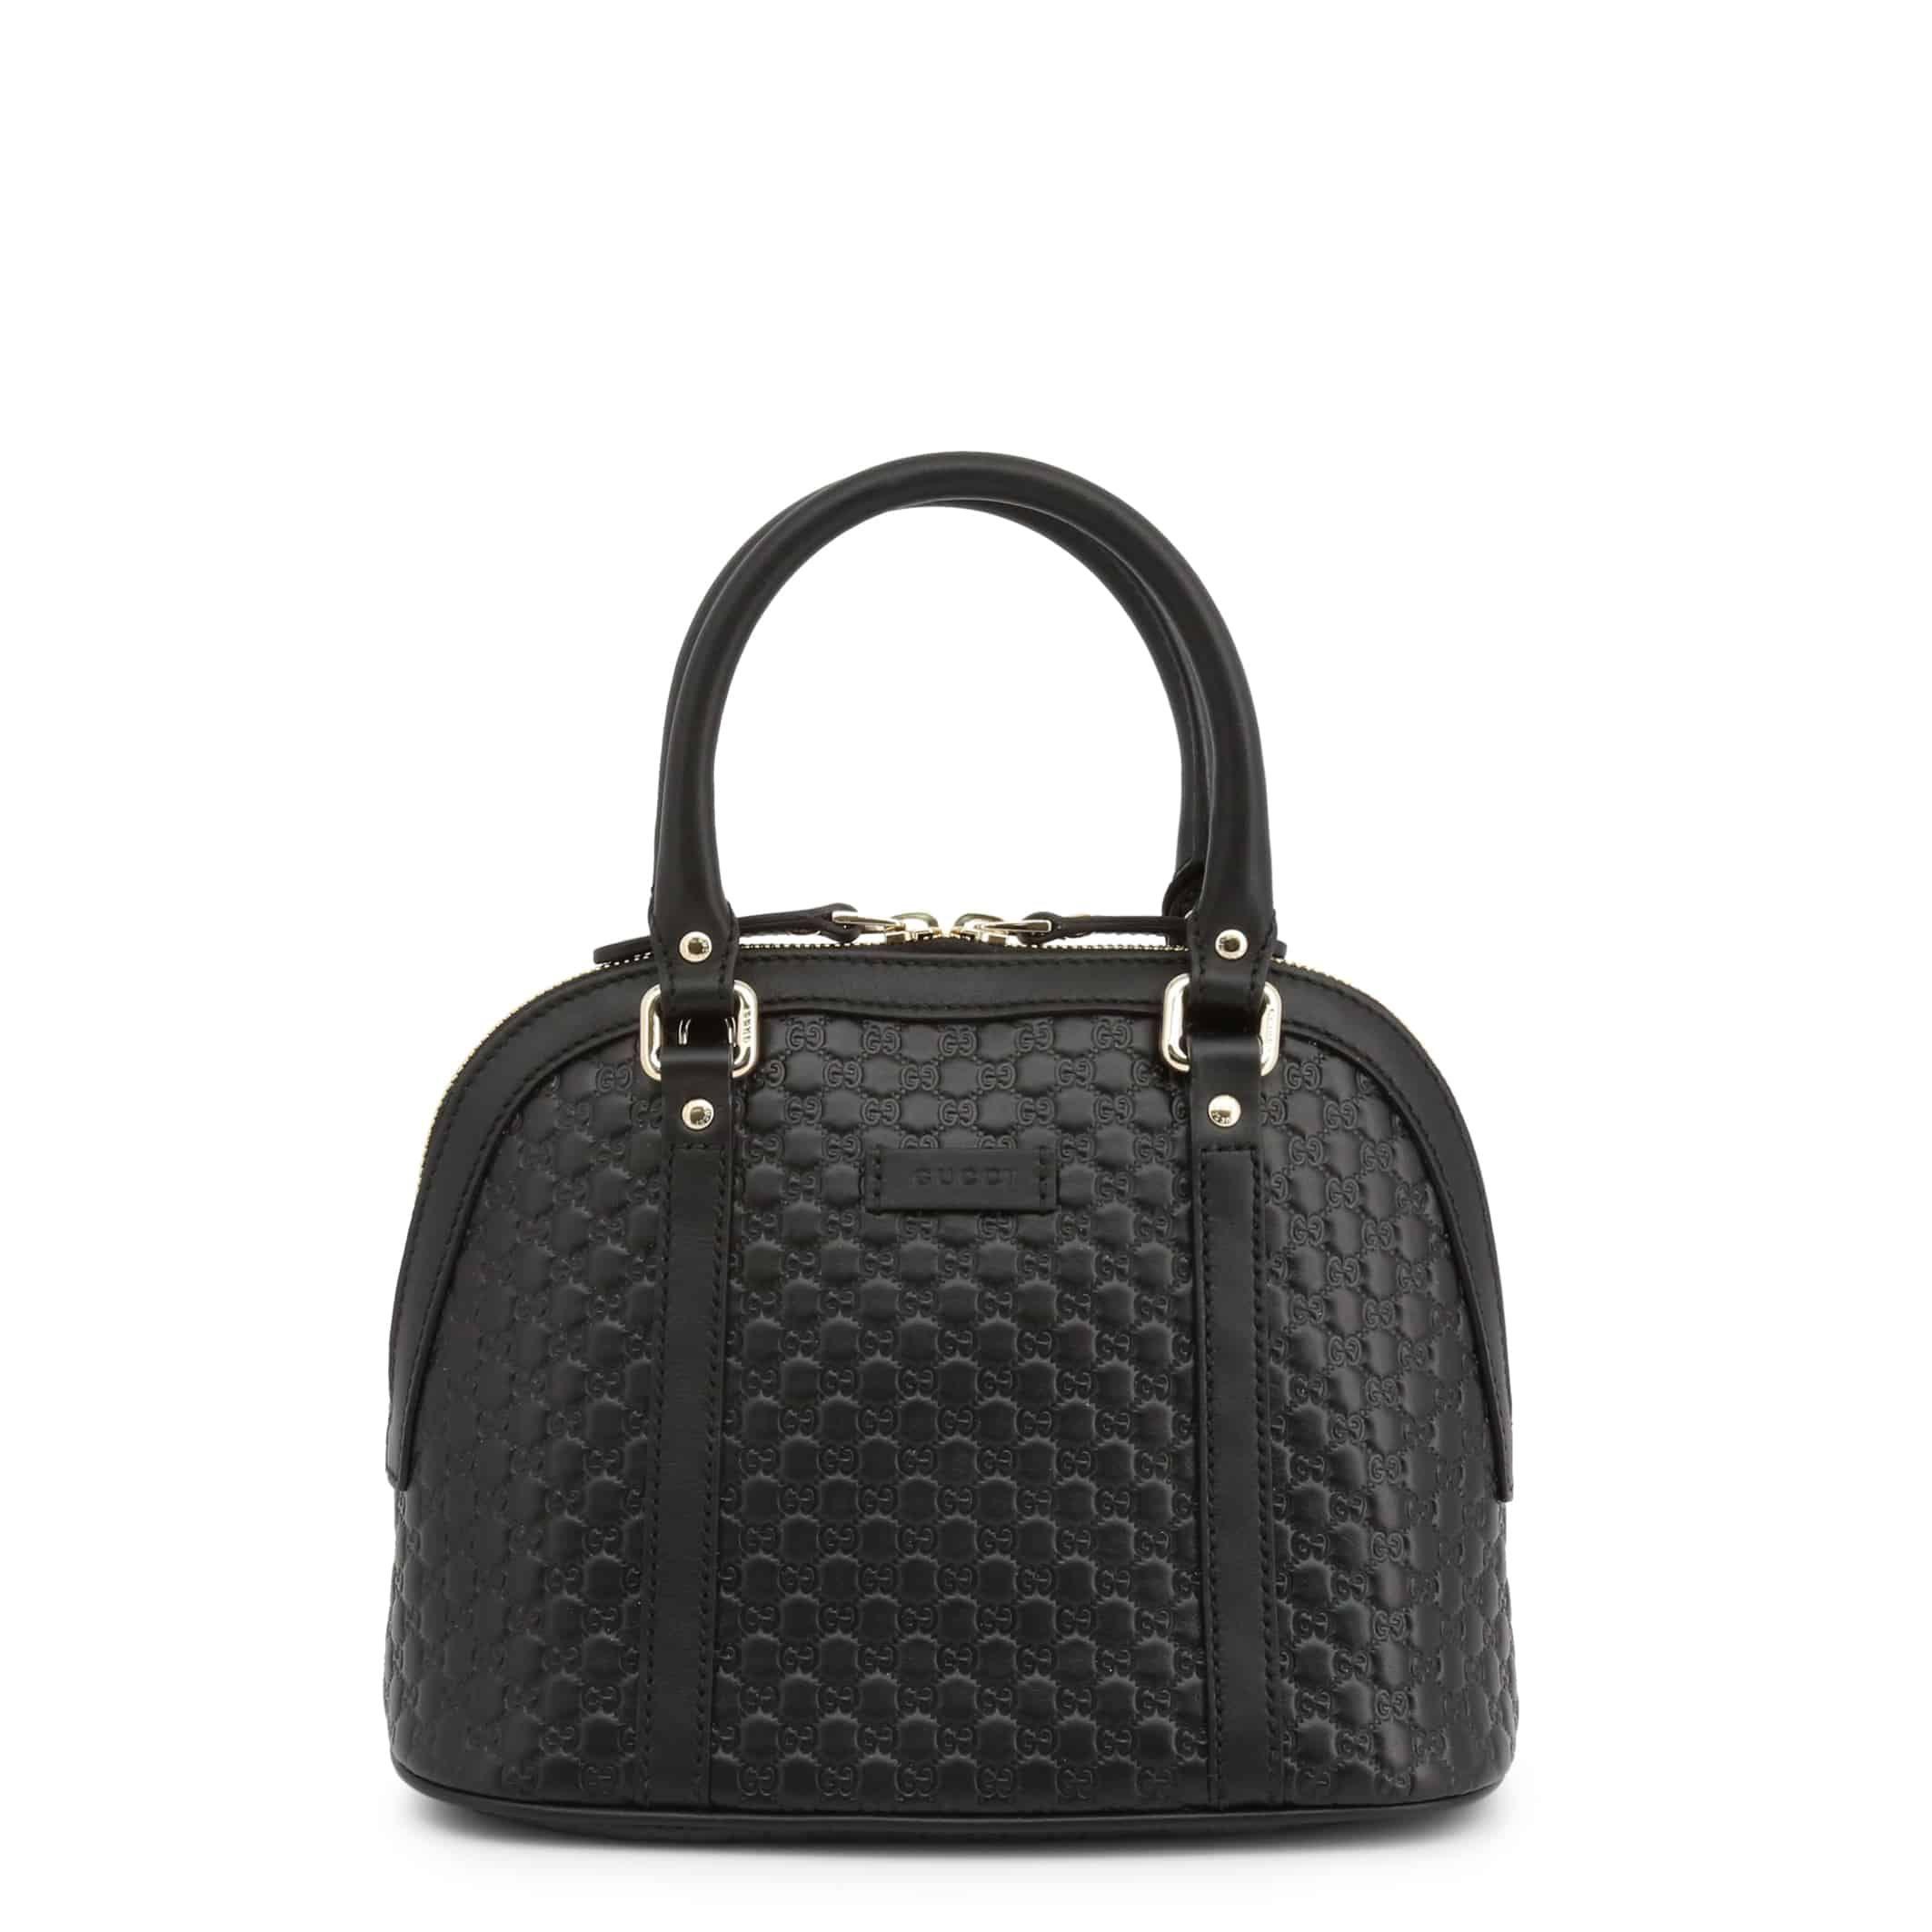 Gucci – 449654_BMJ1G